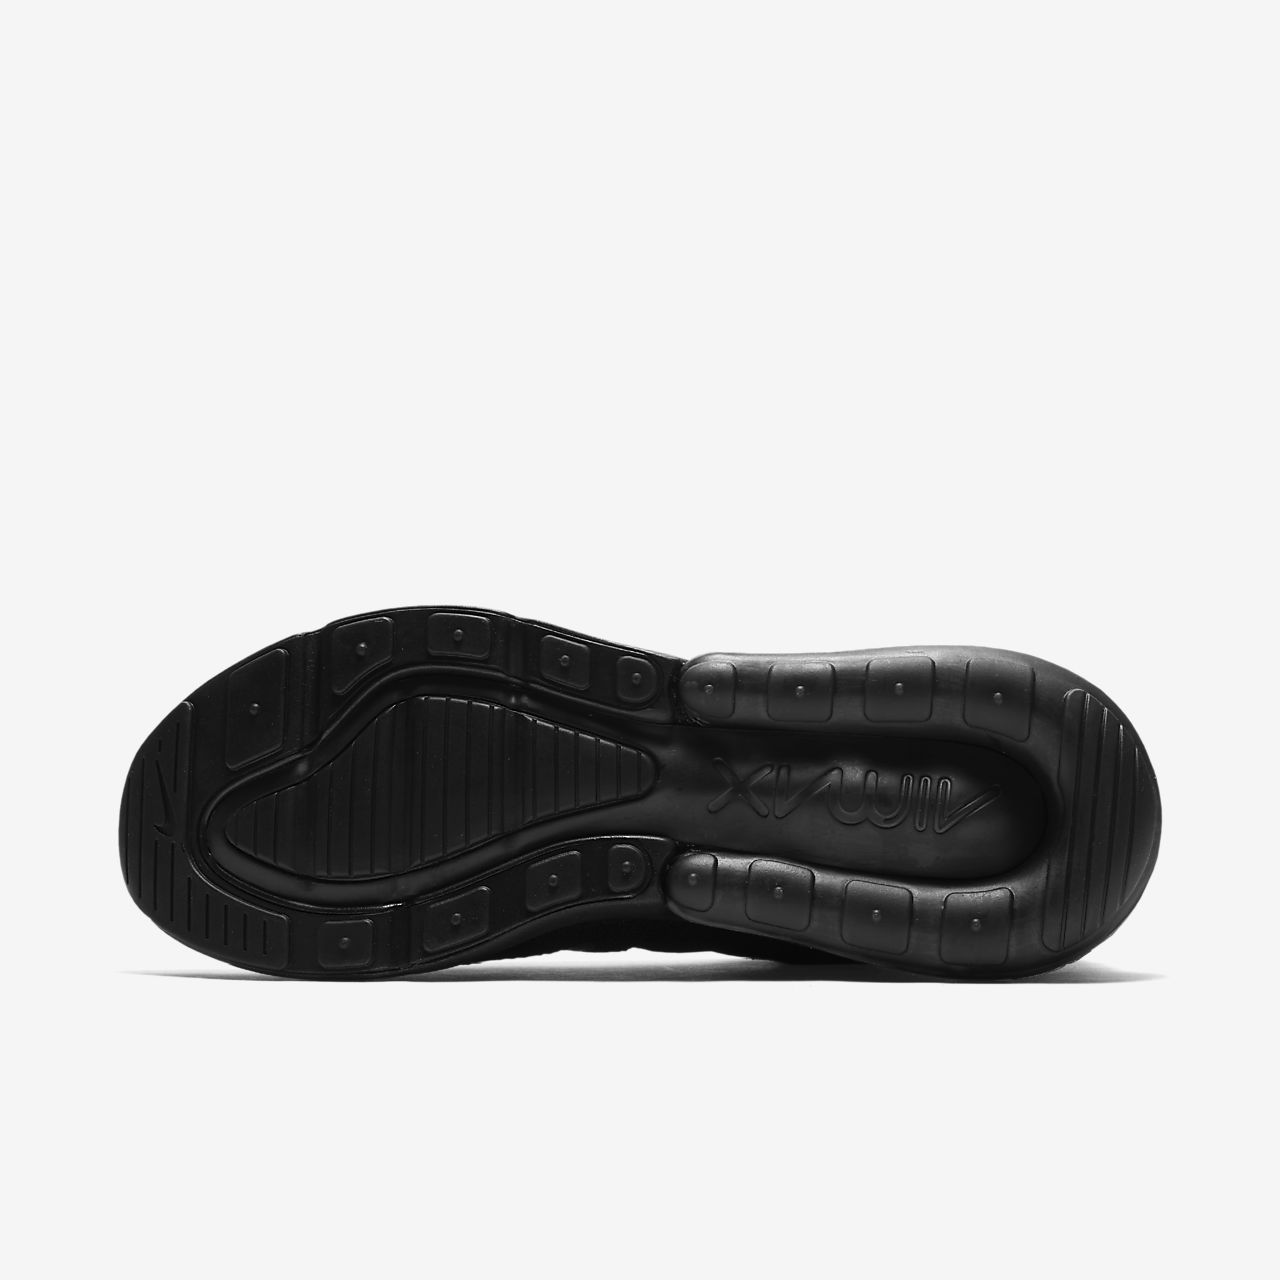 58aad7de05 Nike Air Max 270 Flyknit Men's Shoe. Nike.com ID